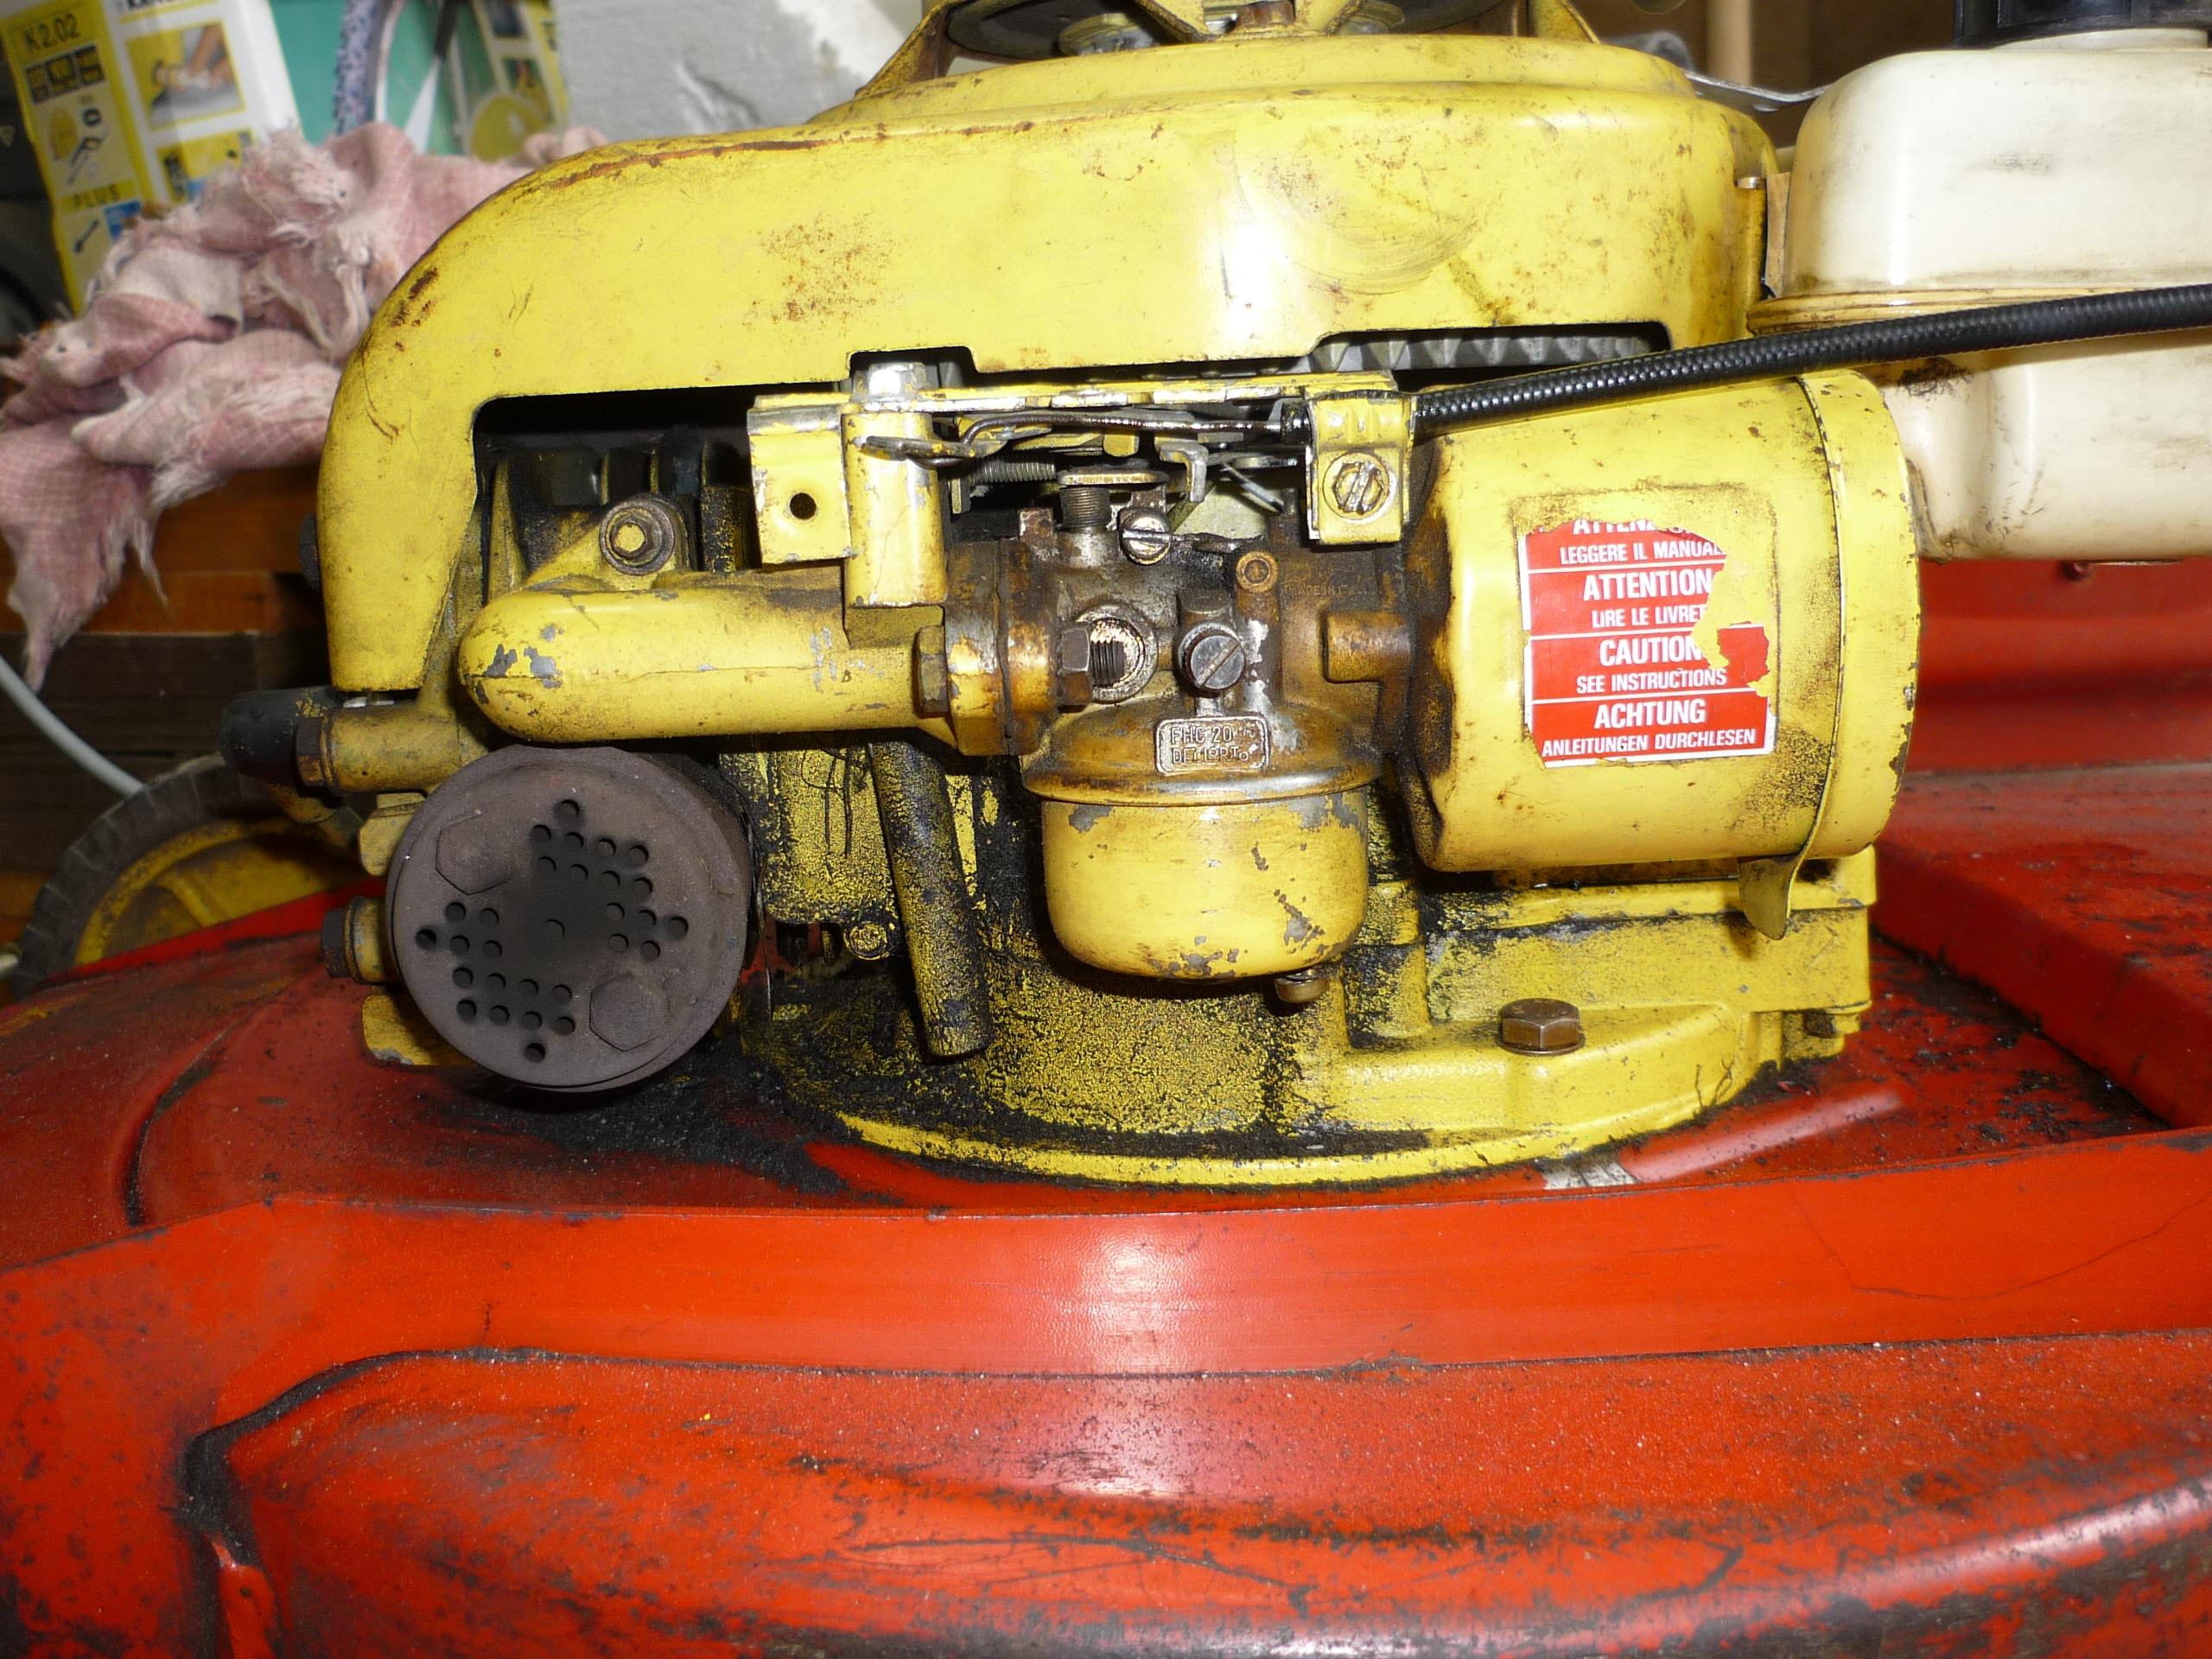 Regulacja ga�nika w kosiarce z silnikiem Tecumseh